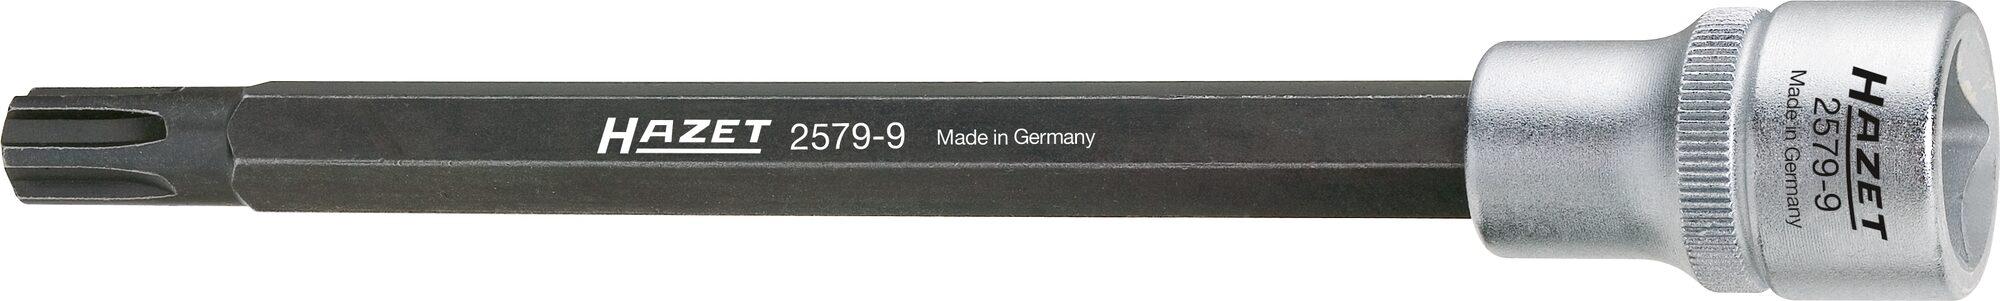 HAZET Zylinderkopf Schraubendreher-Steckschlüsseleinsatz 2579-9 ∙ Vierkant hohl 12,5 mm (1/2 Zoll) ∙ Polydrive Profil